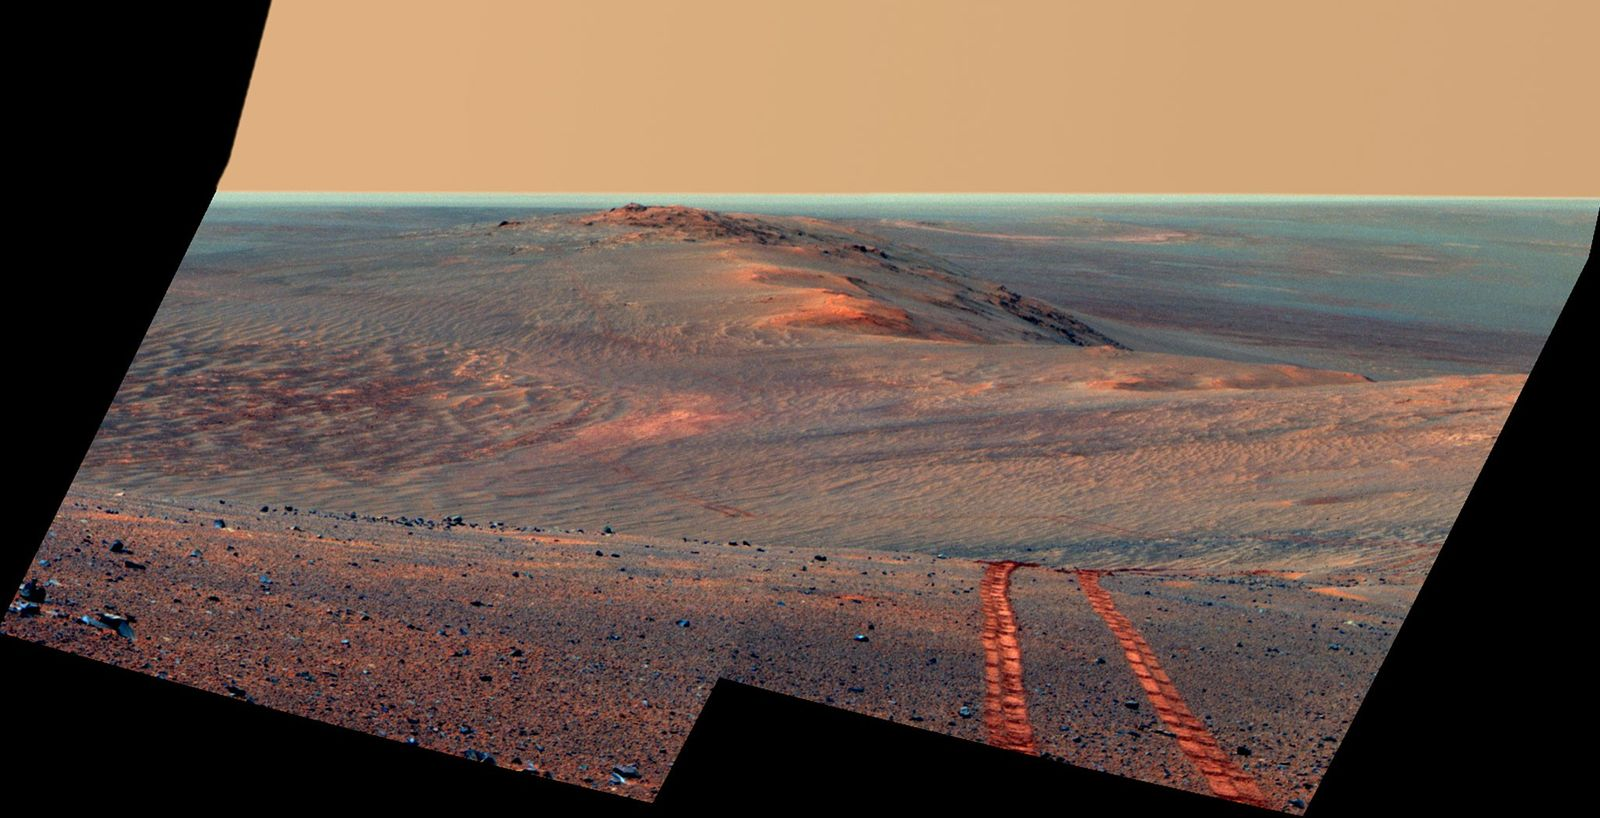 Cráter Endeavor